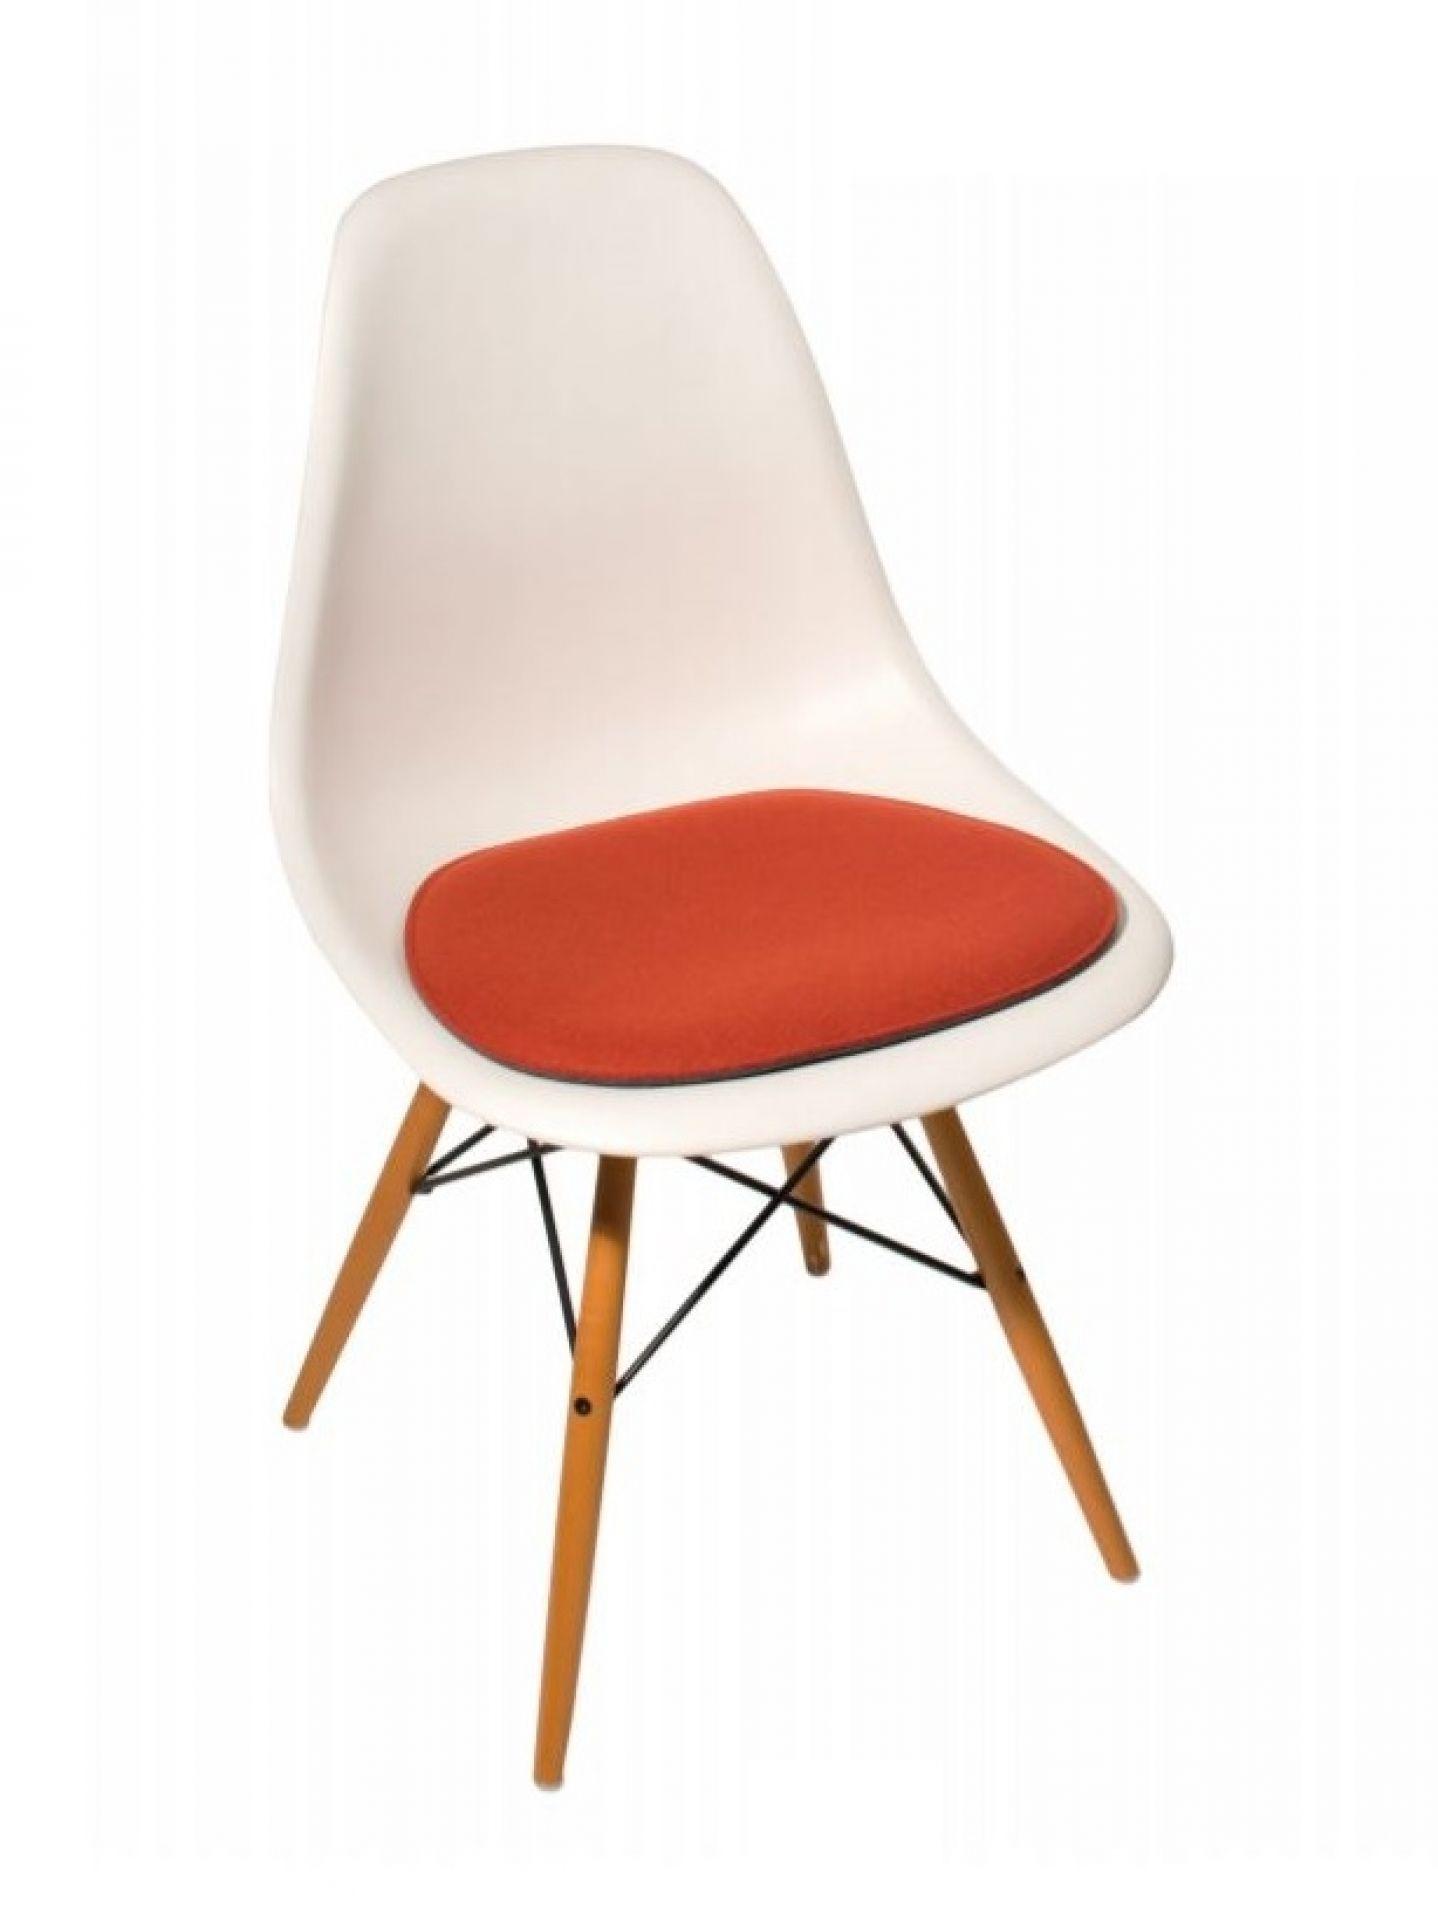 Sitzkissen Eames Side Chair DSR,DSW,DSX Parkhaus Berlin